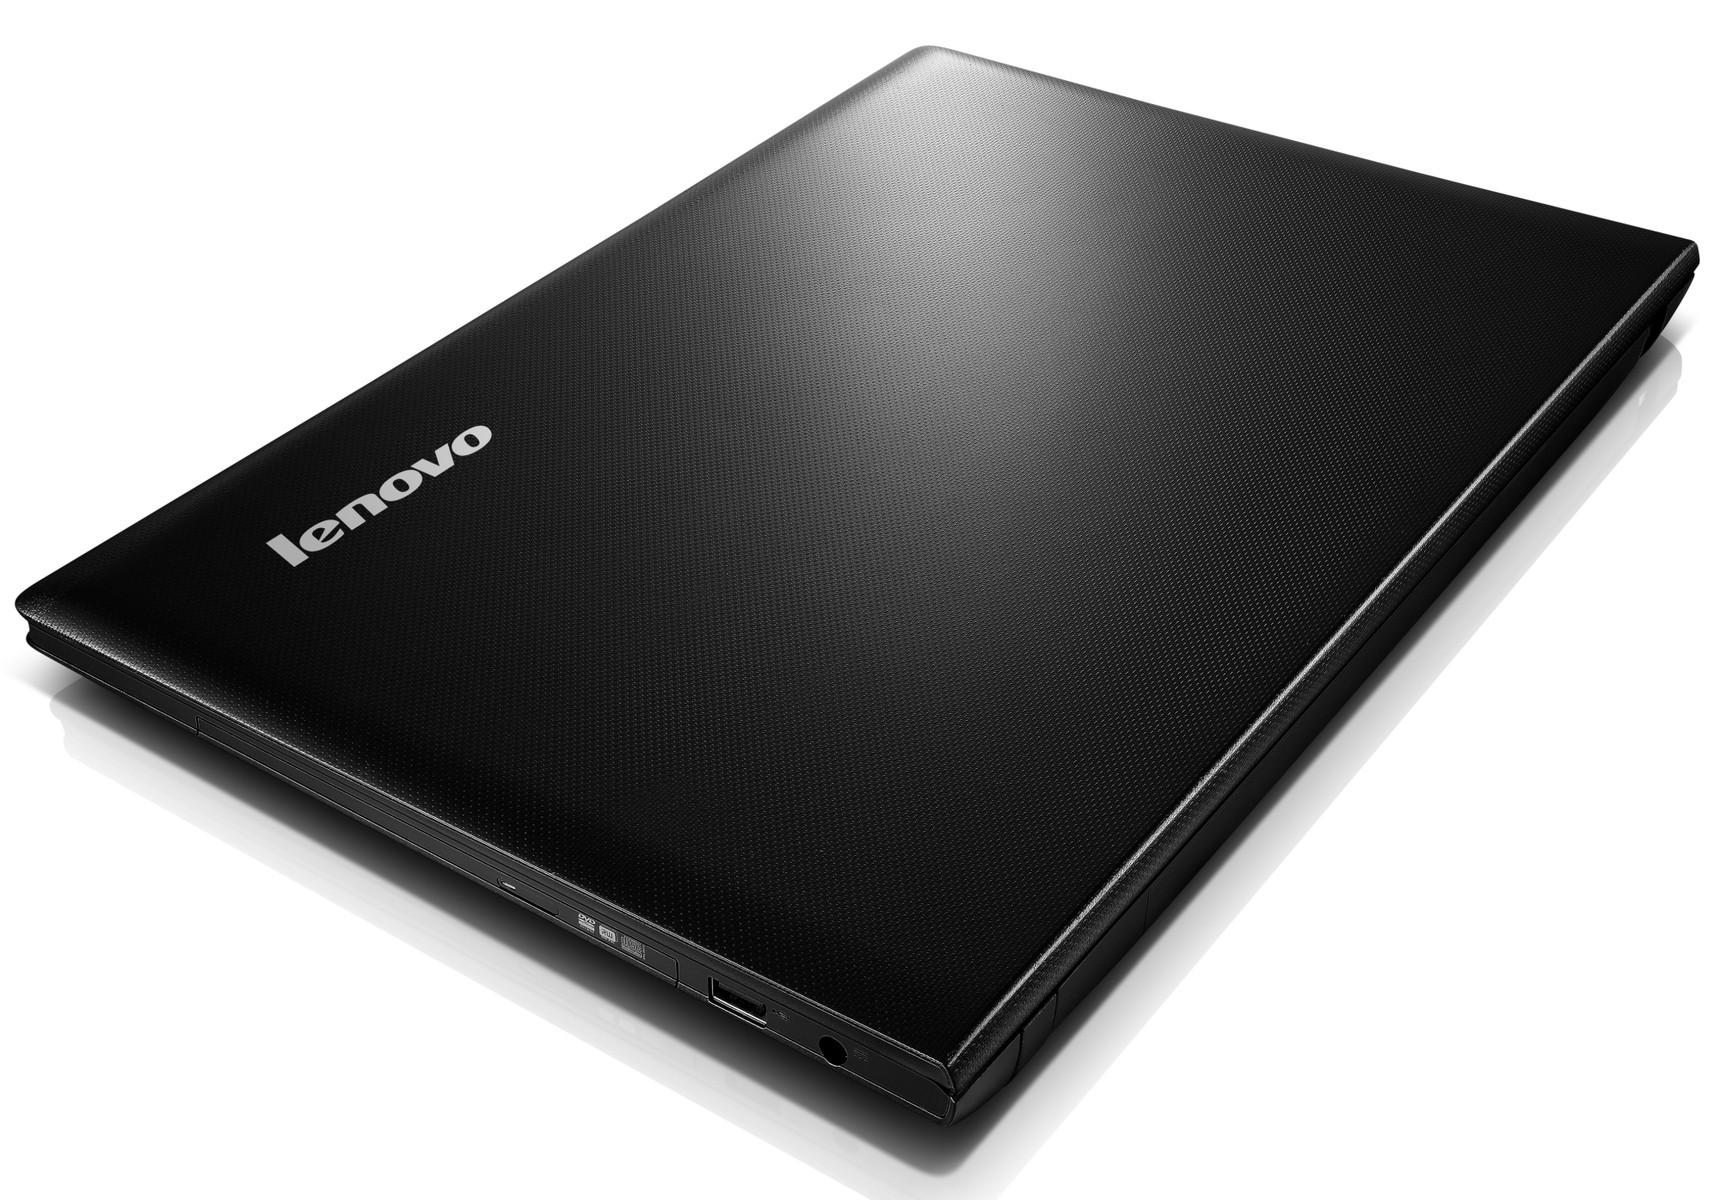 LENOVO 3000 G510 AUDIO DRIVER WINDOWS